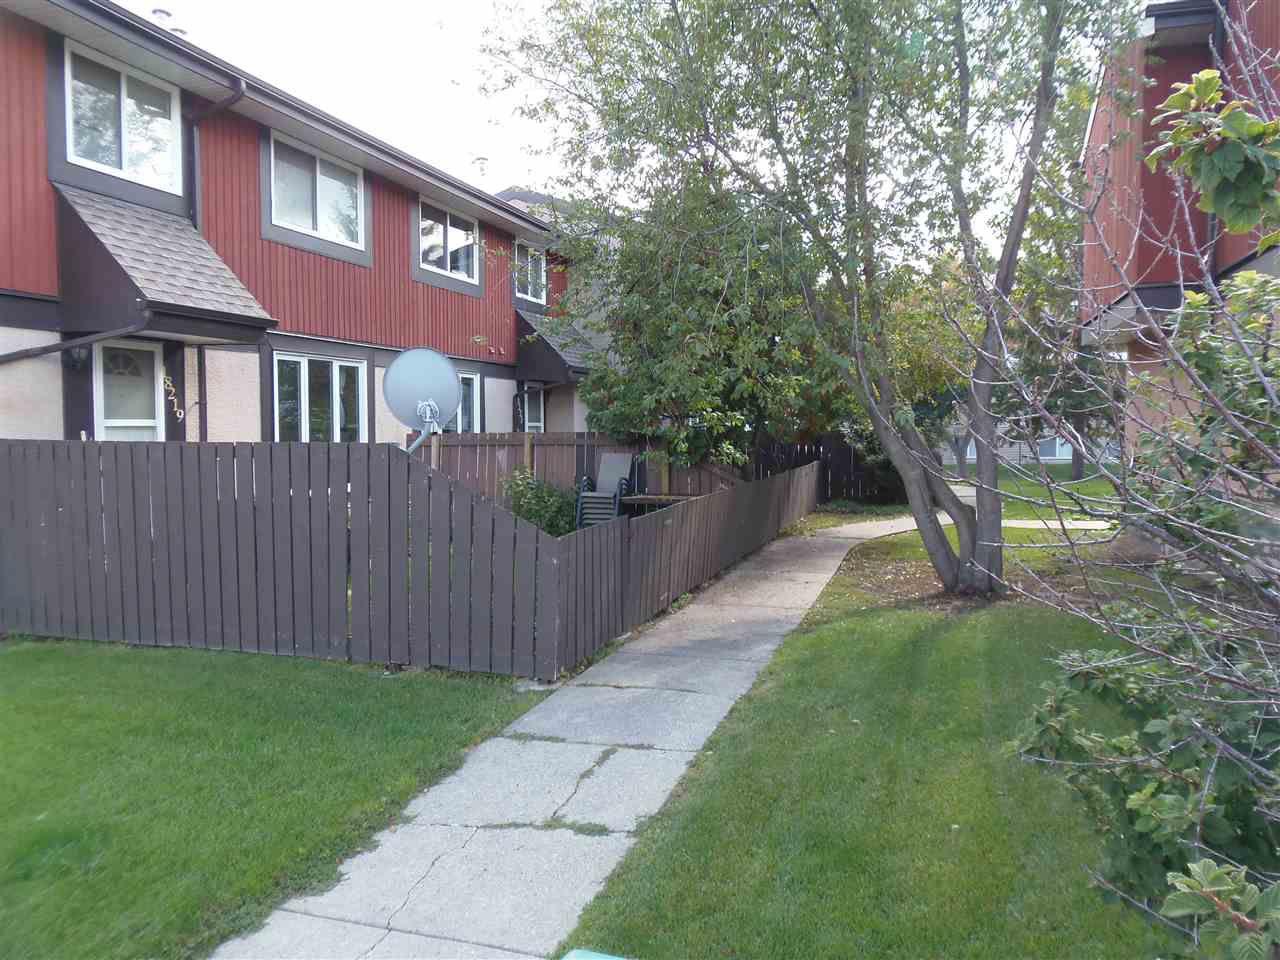 Main Photo: 18223 84 Avenue in Edmonton: Zone 20 Townhouse for sale : MLS®# E4129864